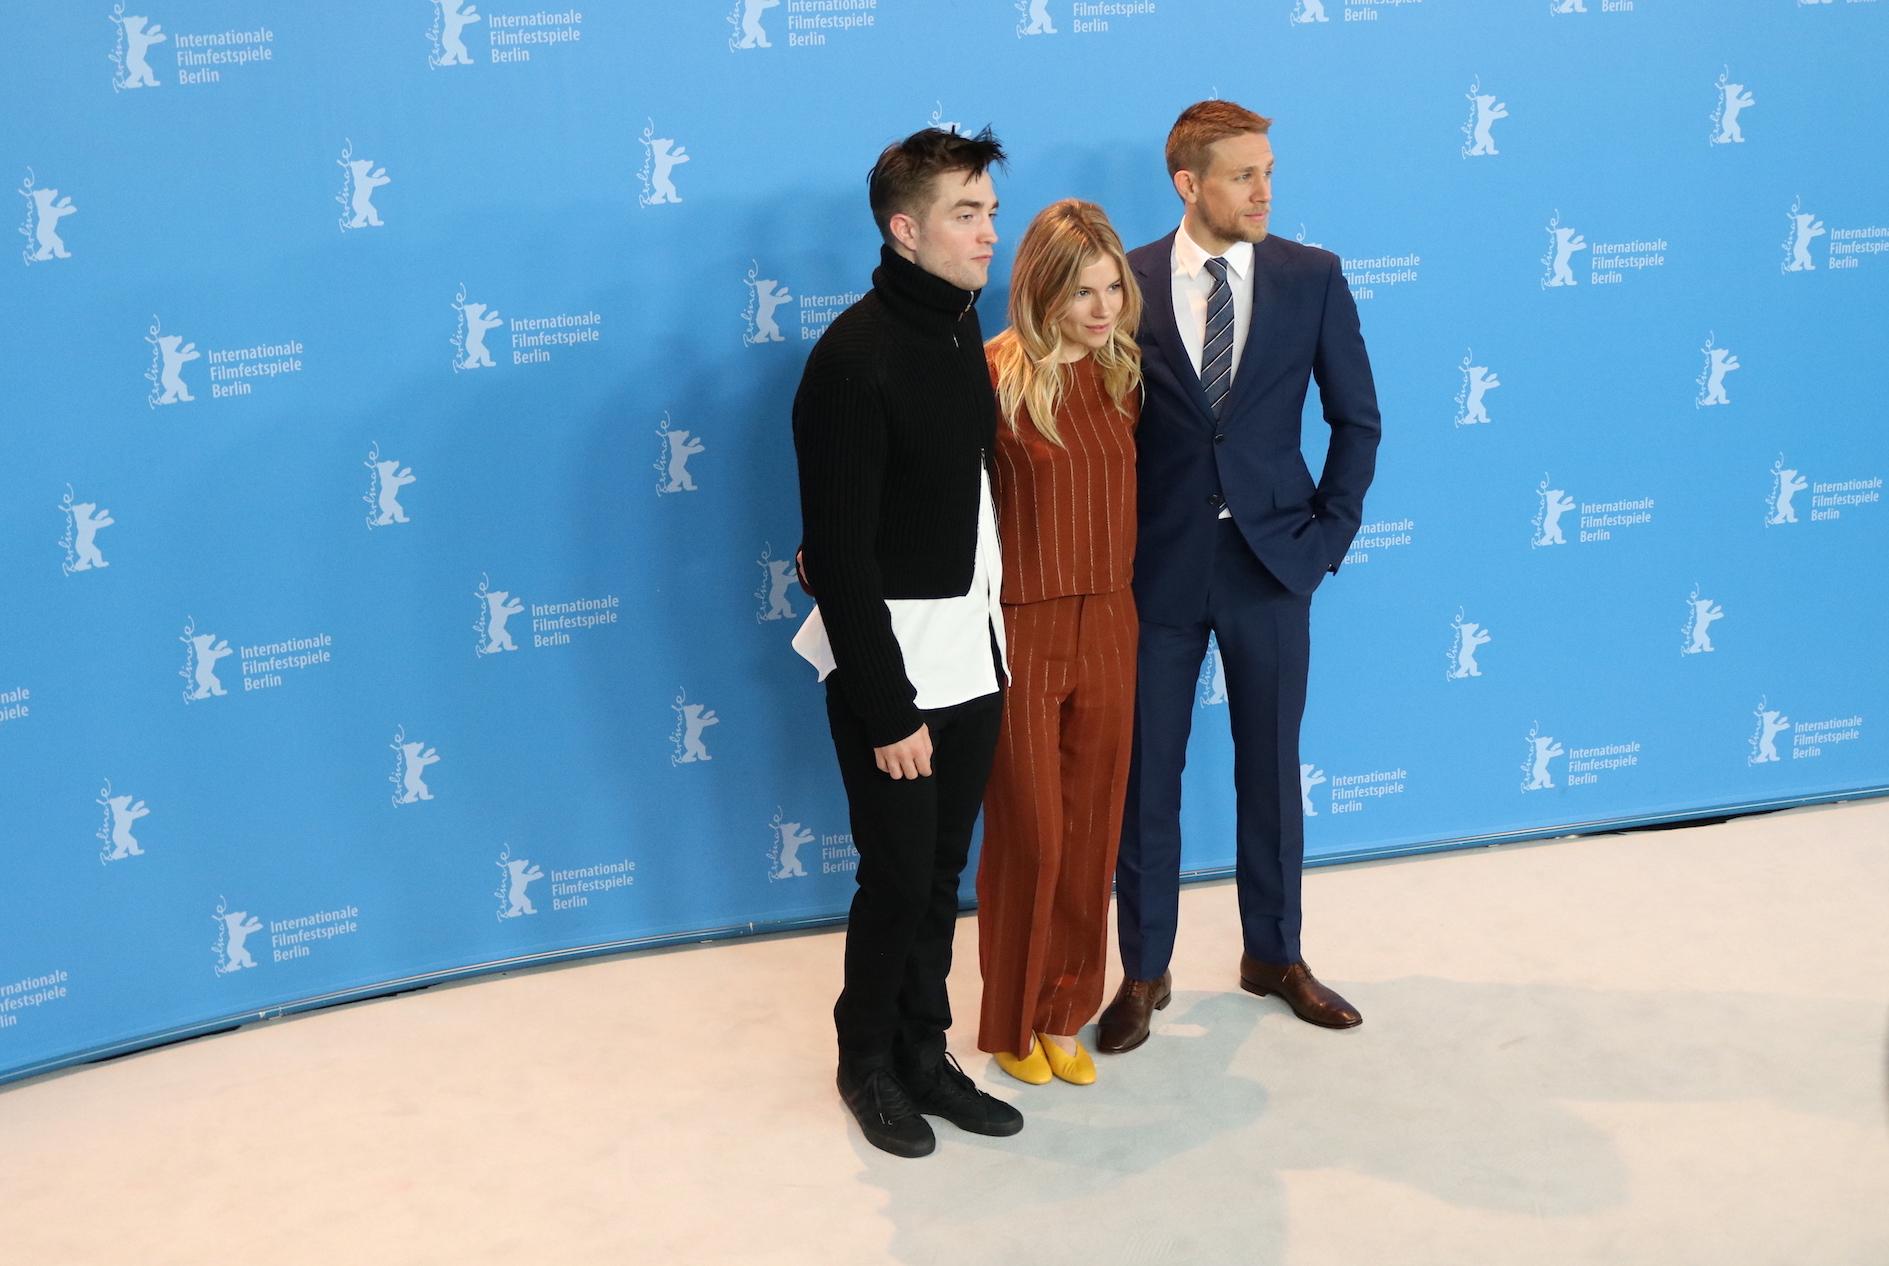 Berlino 2017: Robert Pattinson, Sienna Miller e Charlie Hunnam davanti ai fotogradi per Z - la città perduta